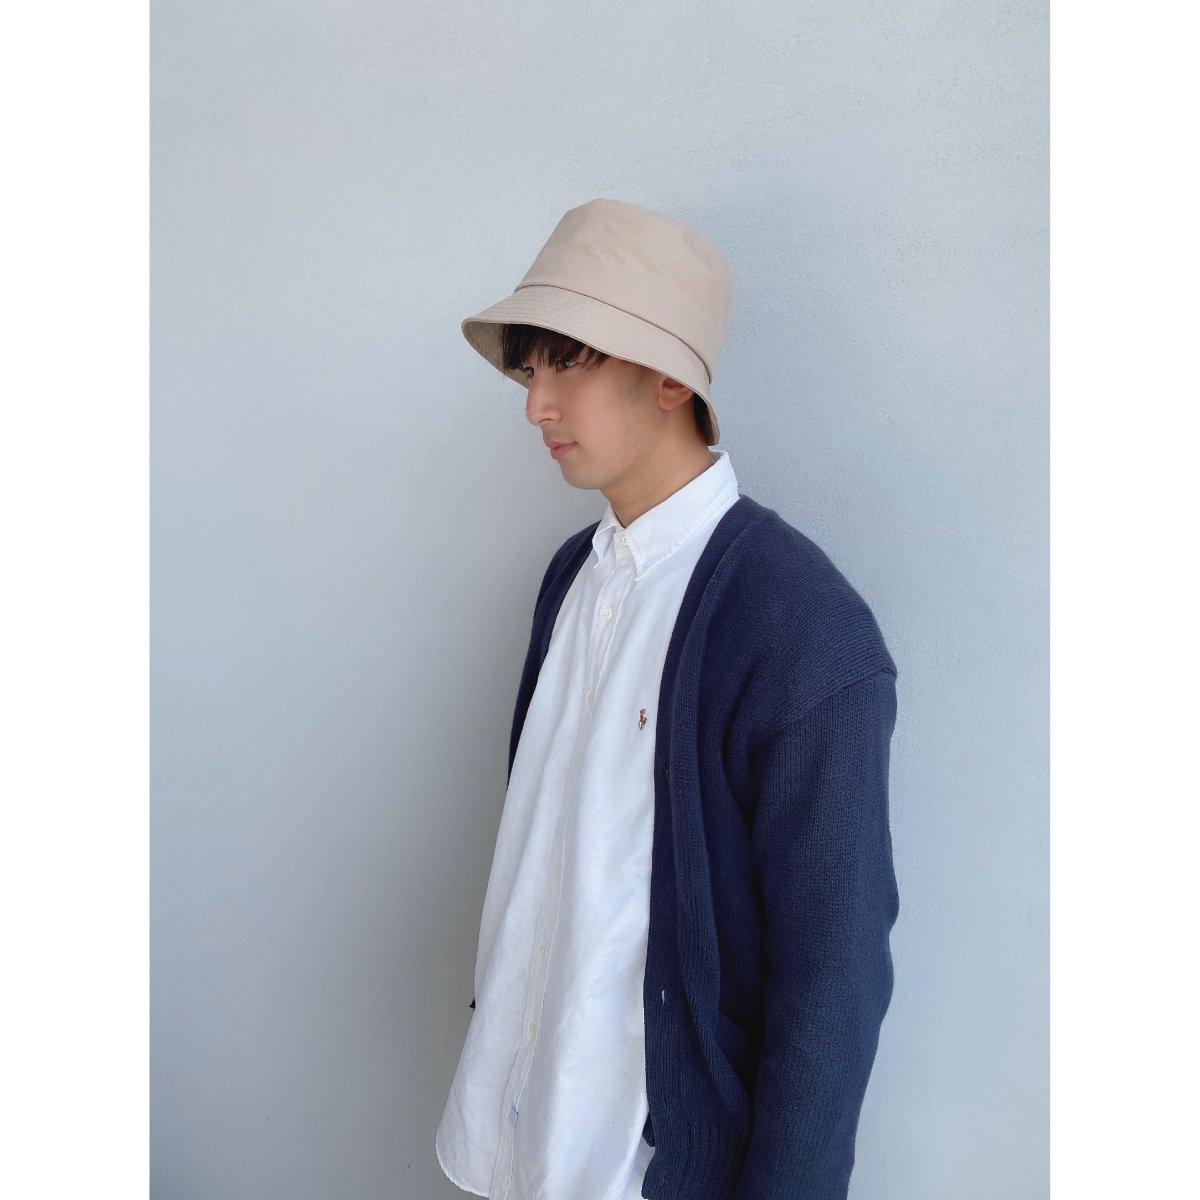 Genius BK Hat 詳細画像19